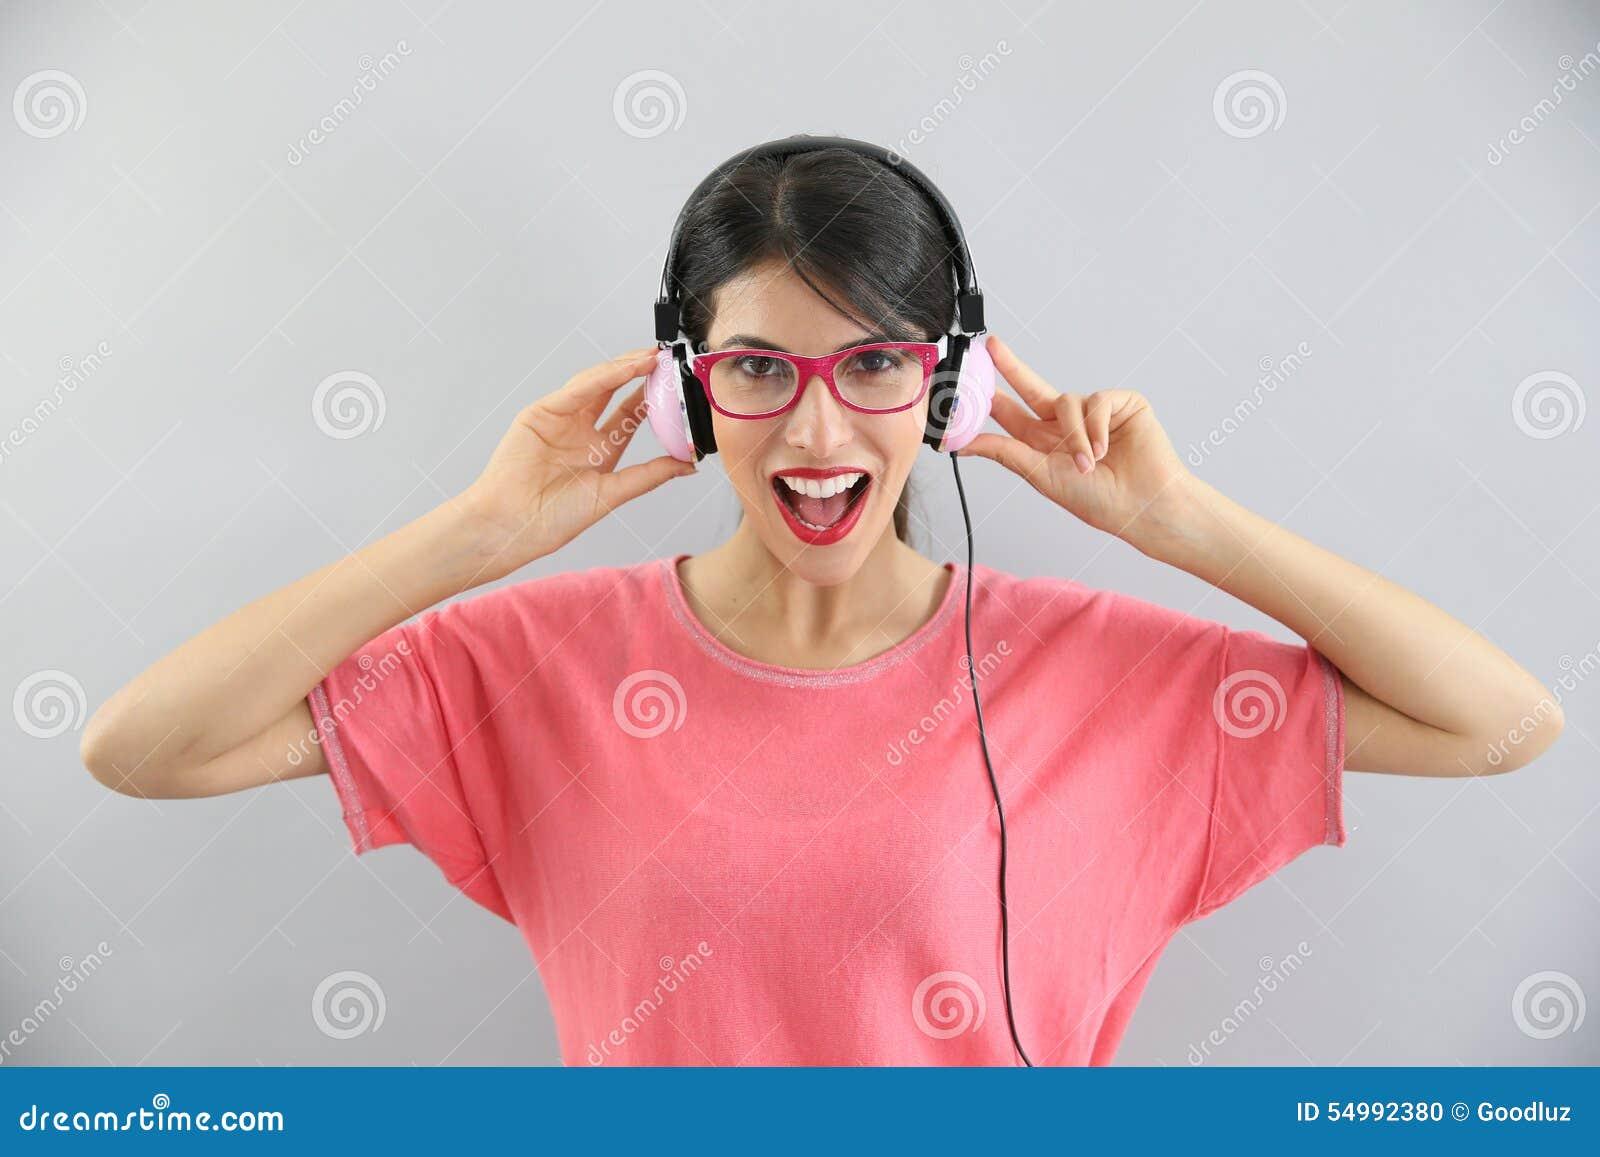 Jovem mulher que canta com fones de ouvido sobre